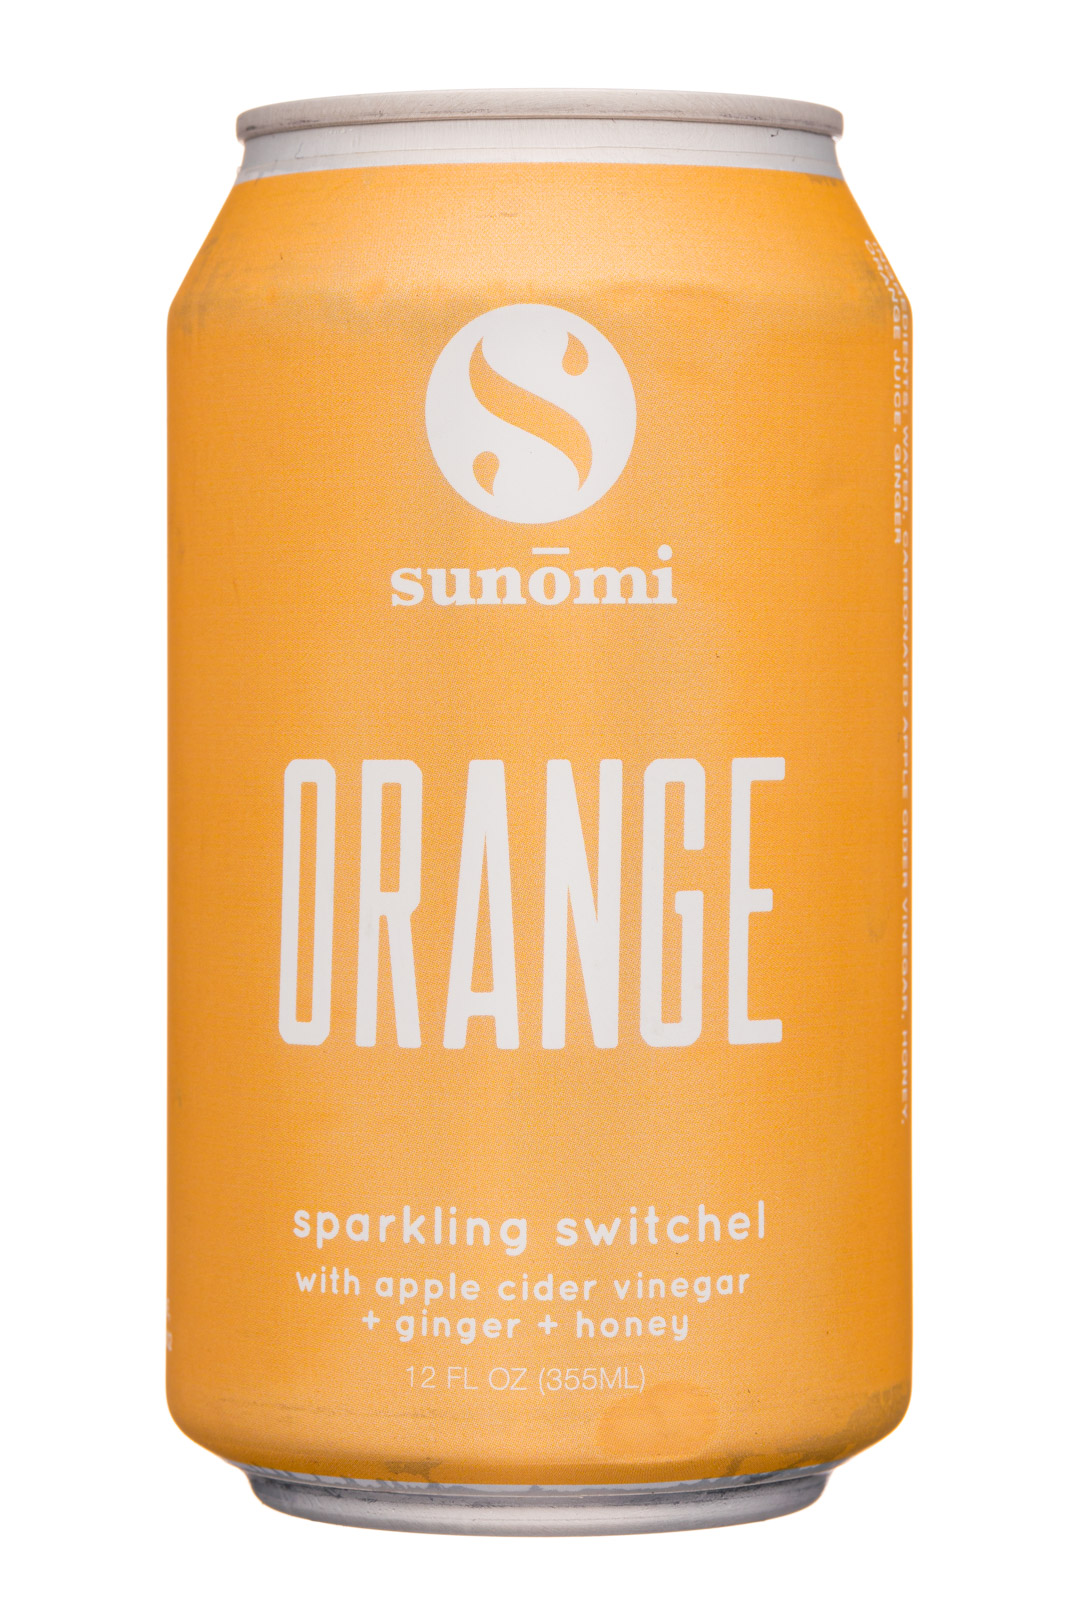 Sunomi: SipCity-12oz-Sunomi-SparklingSwitchel-Orange-Front